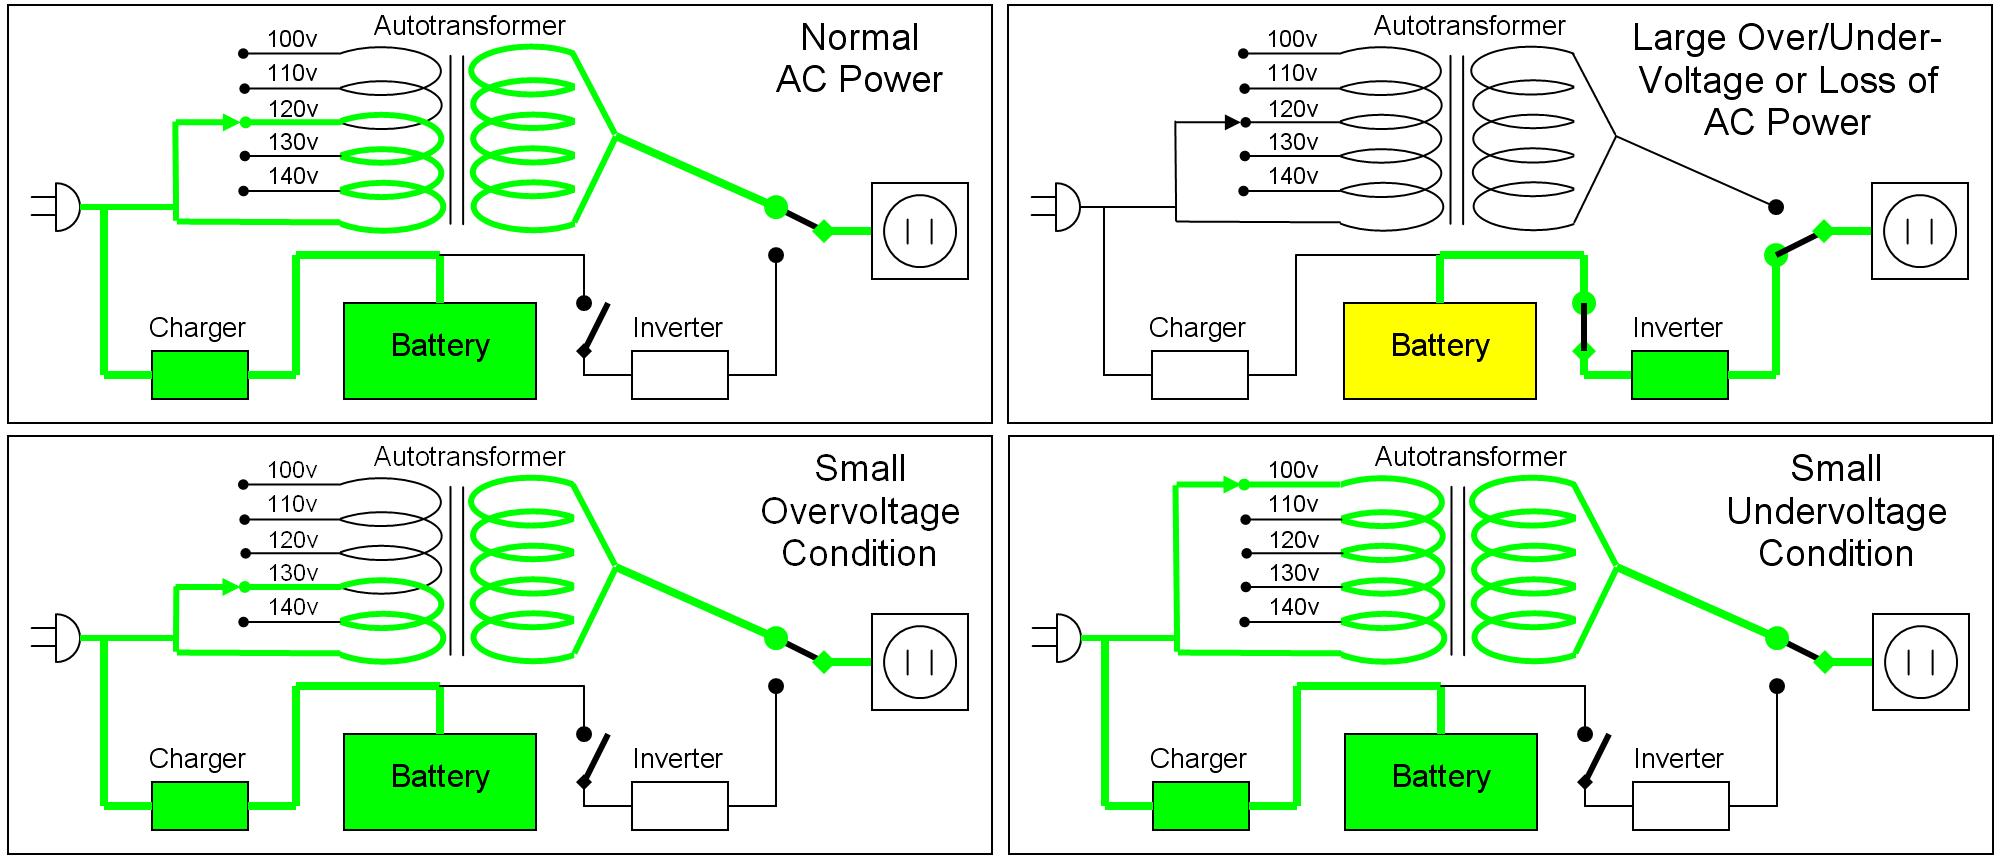 Automatic 12v Battery Charger Circuit Diagram Pdf HP PHOTOSMART PRINTER